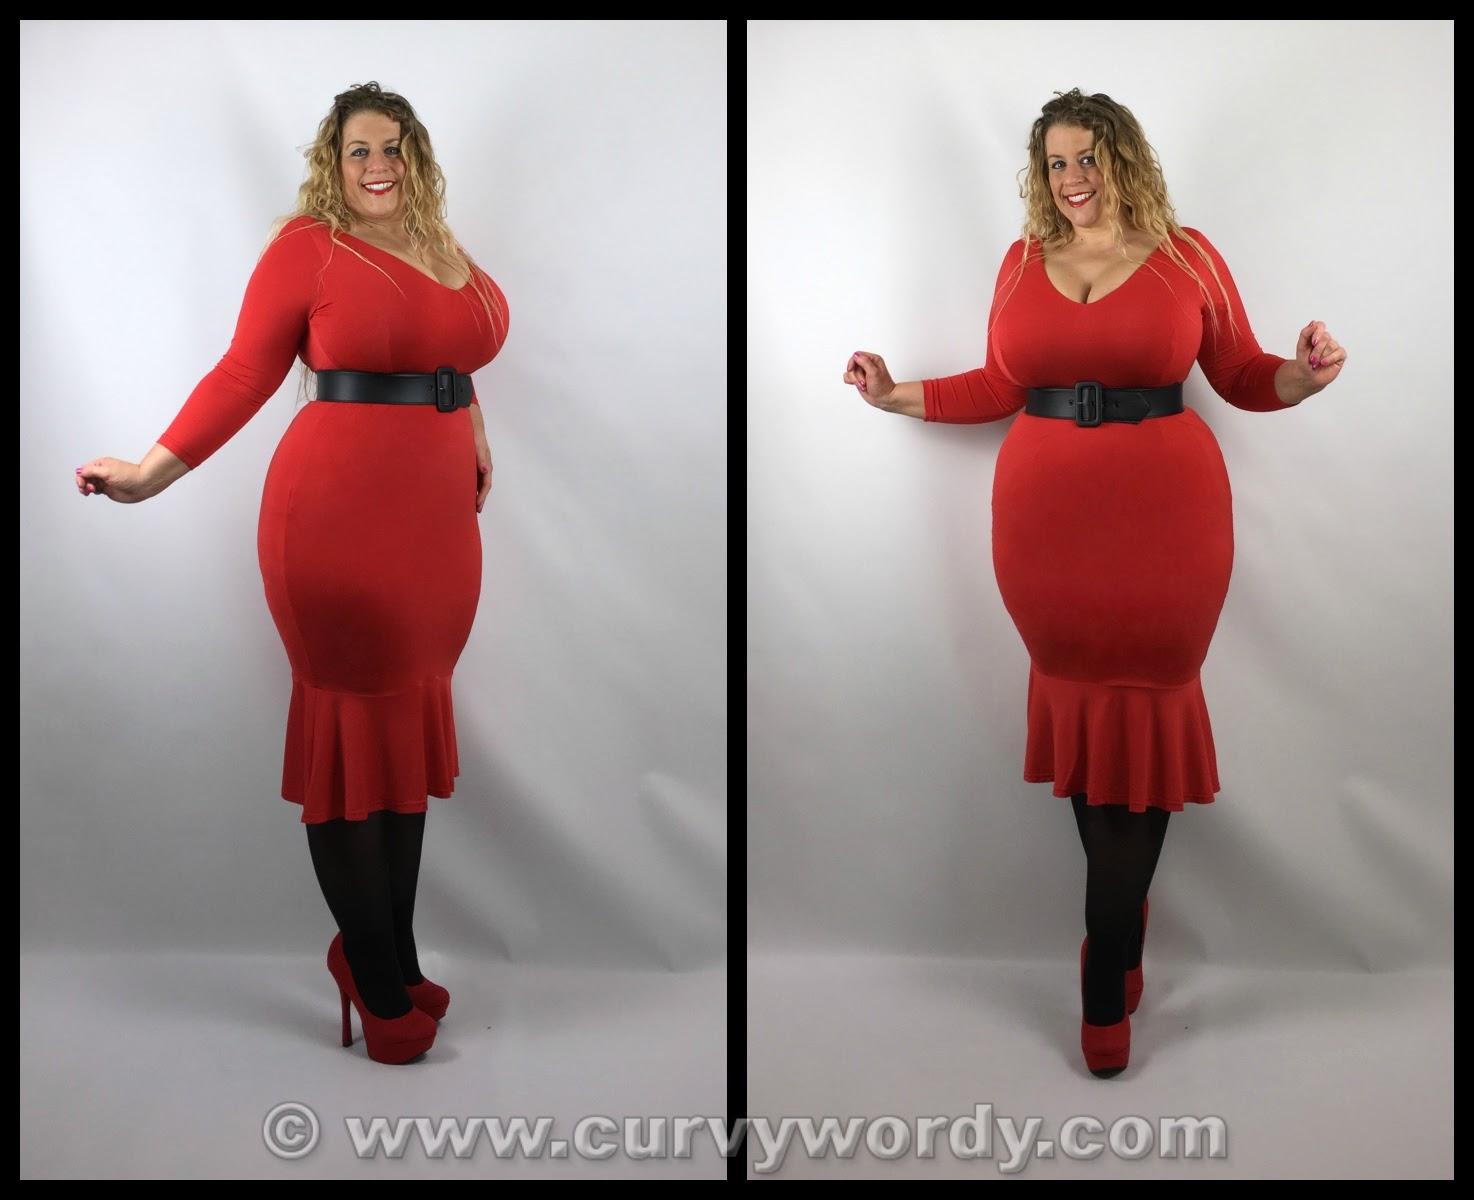 Lady V London: Lady Voluptuous Bellatrix Dress 16 - Curvy